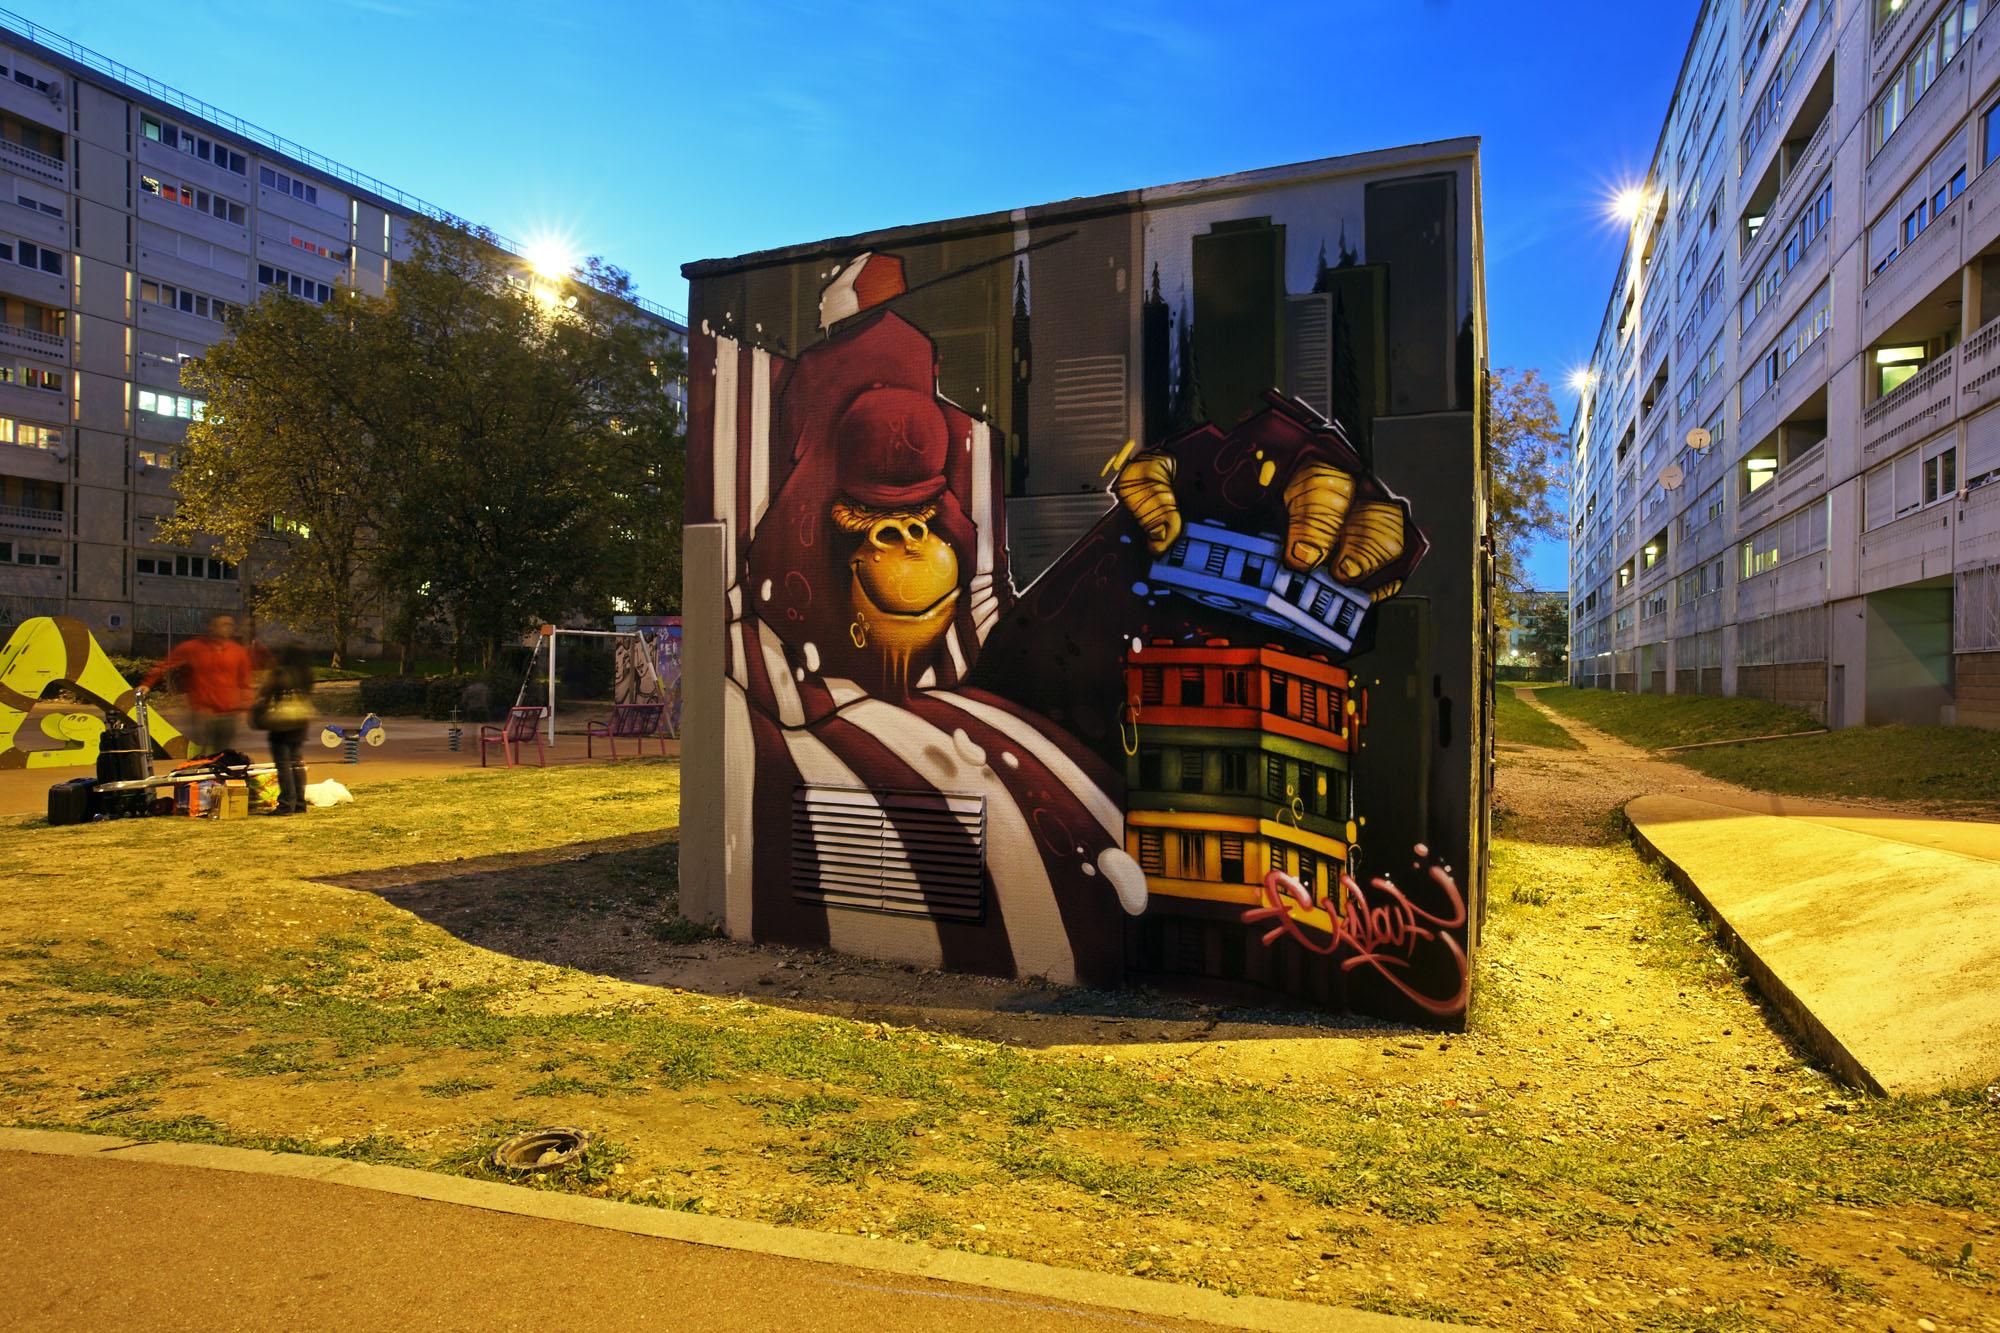 Graff-ik'Art 2015 - Calouf